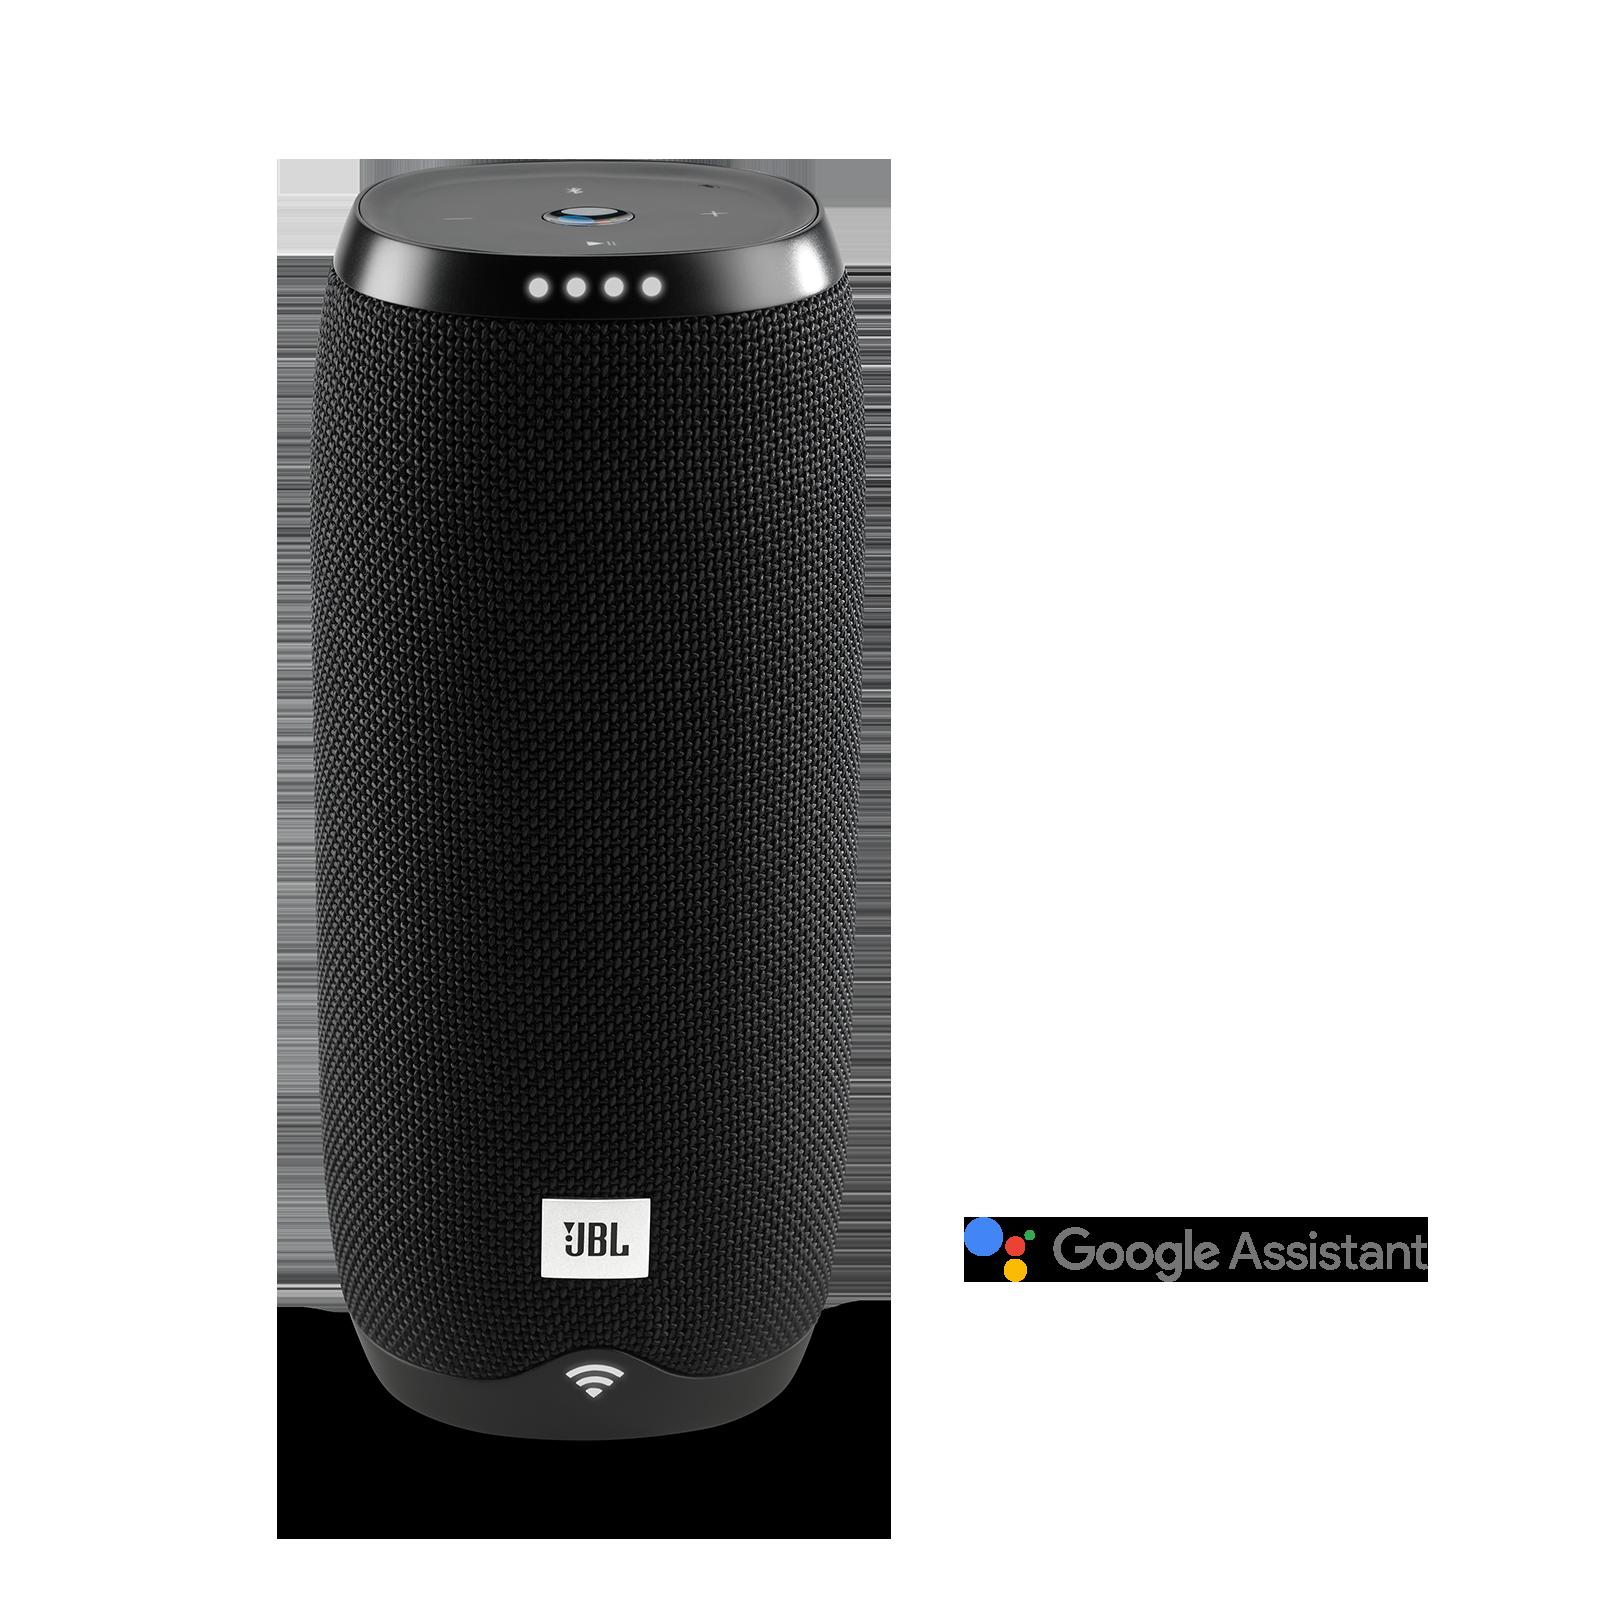 JBL Link 20 - Black - Voice-activated portable speaker - Hero